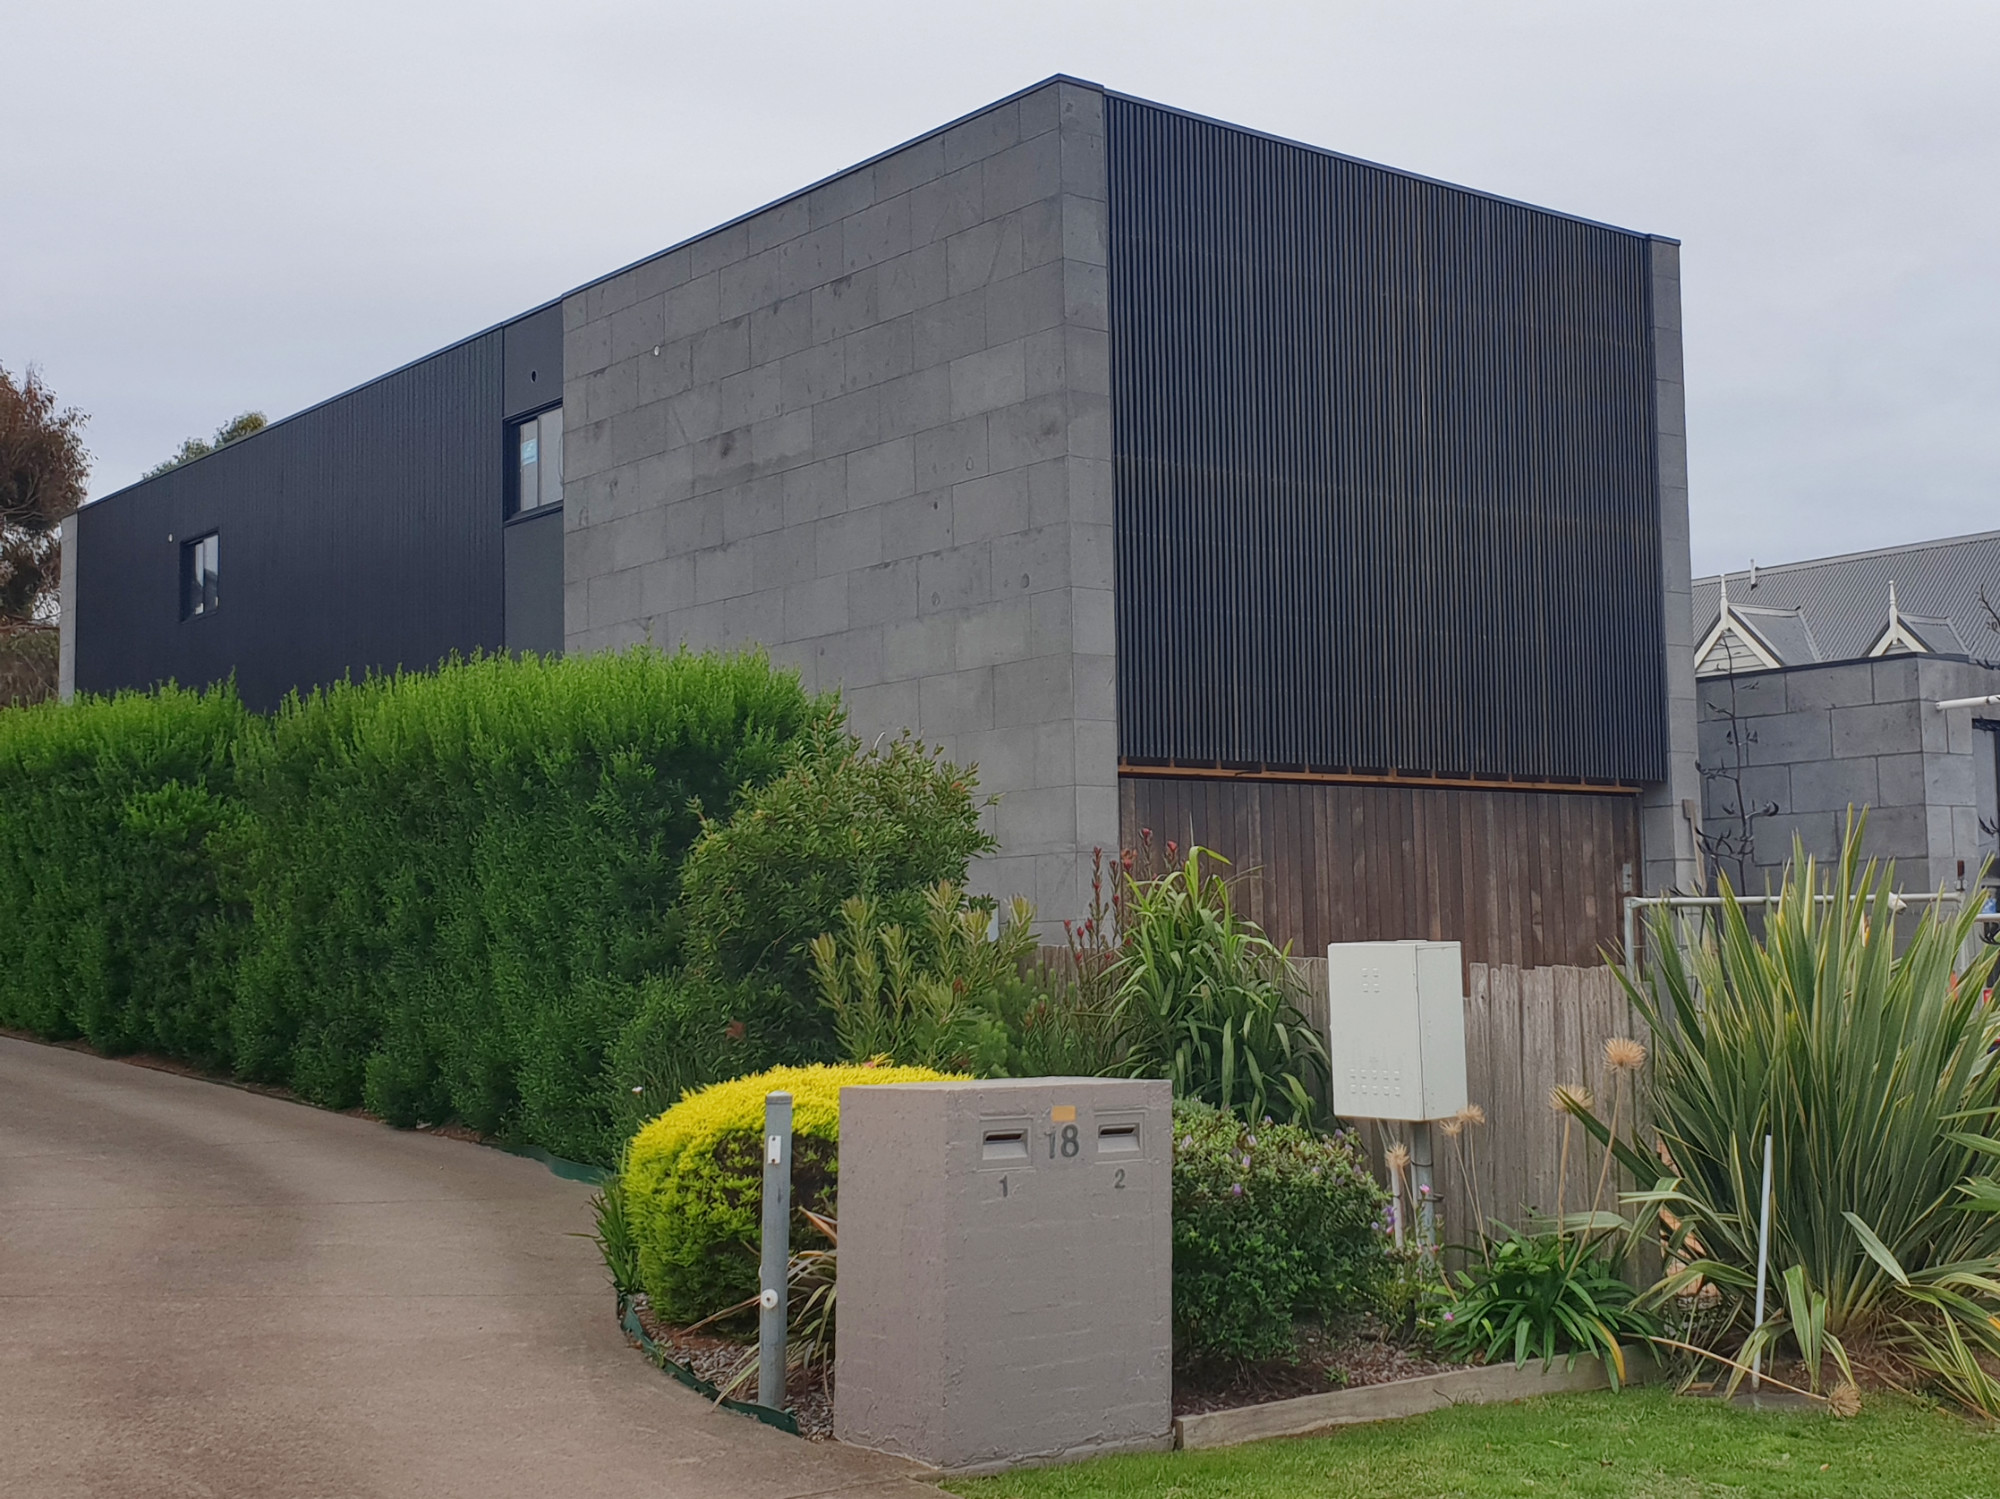 lifespaces bluestone house facade under construction